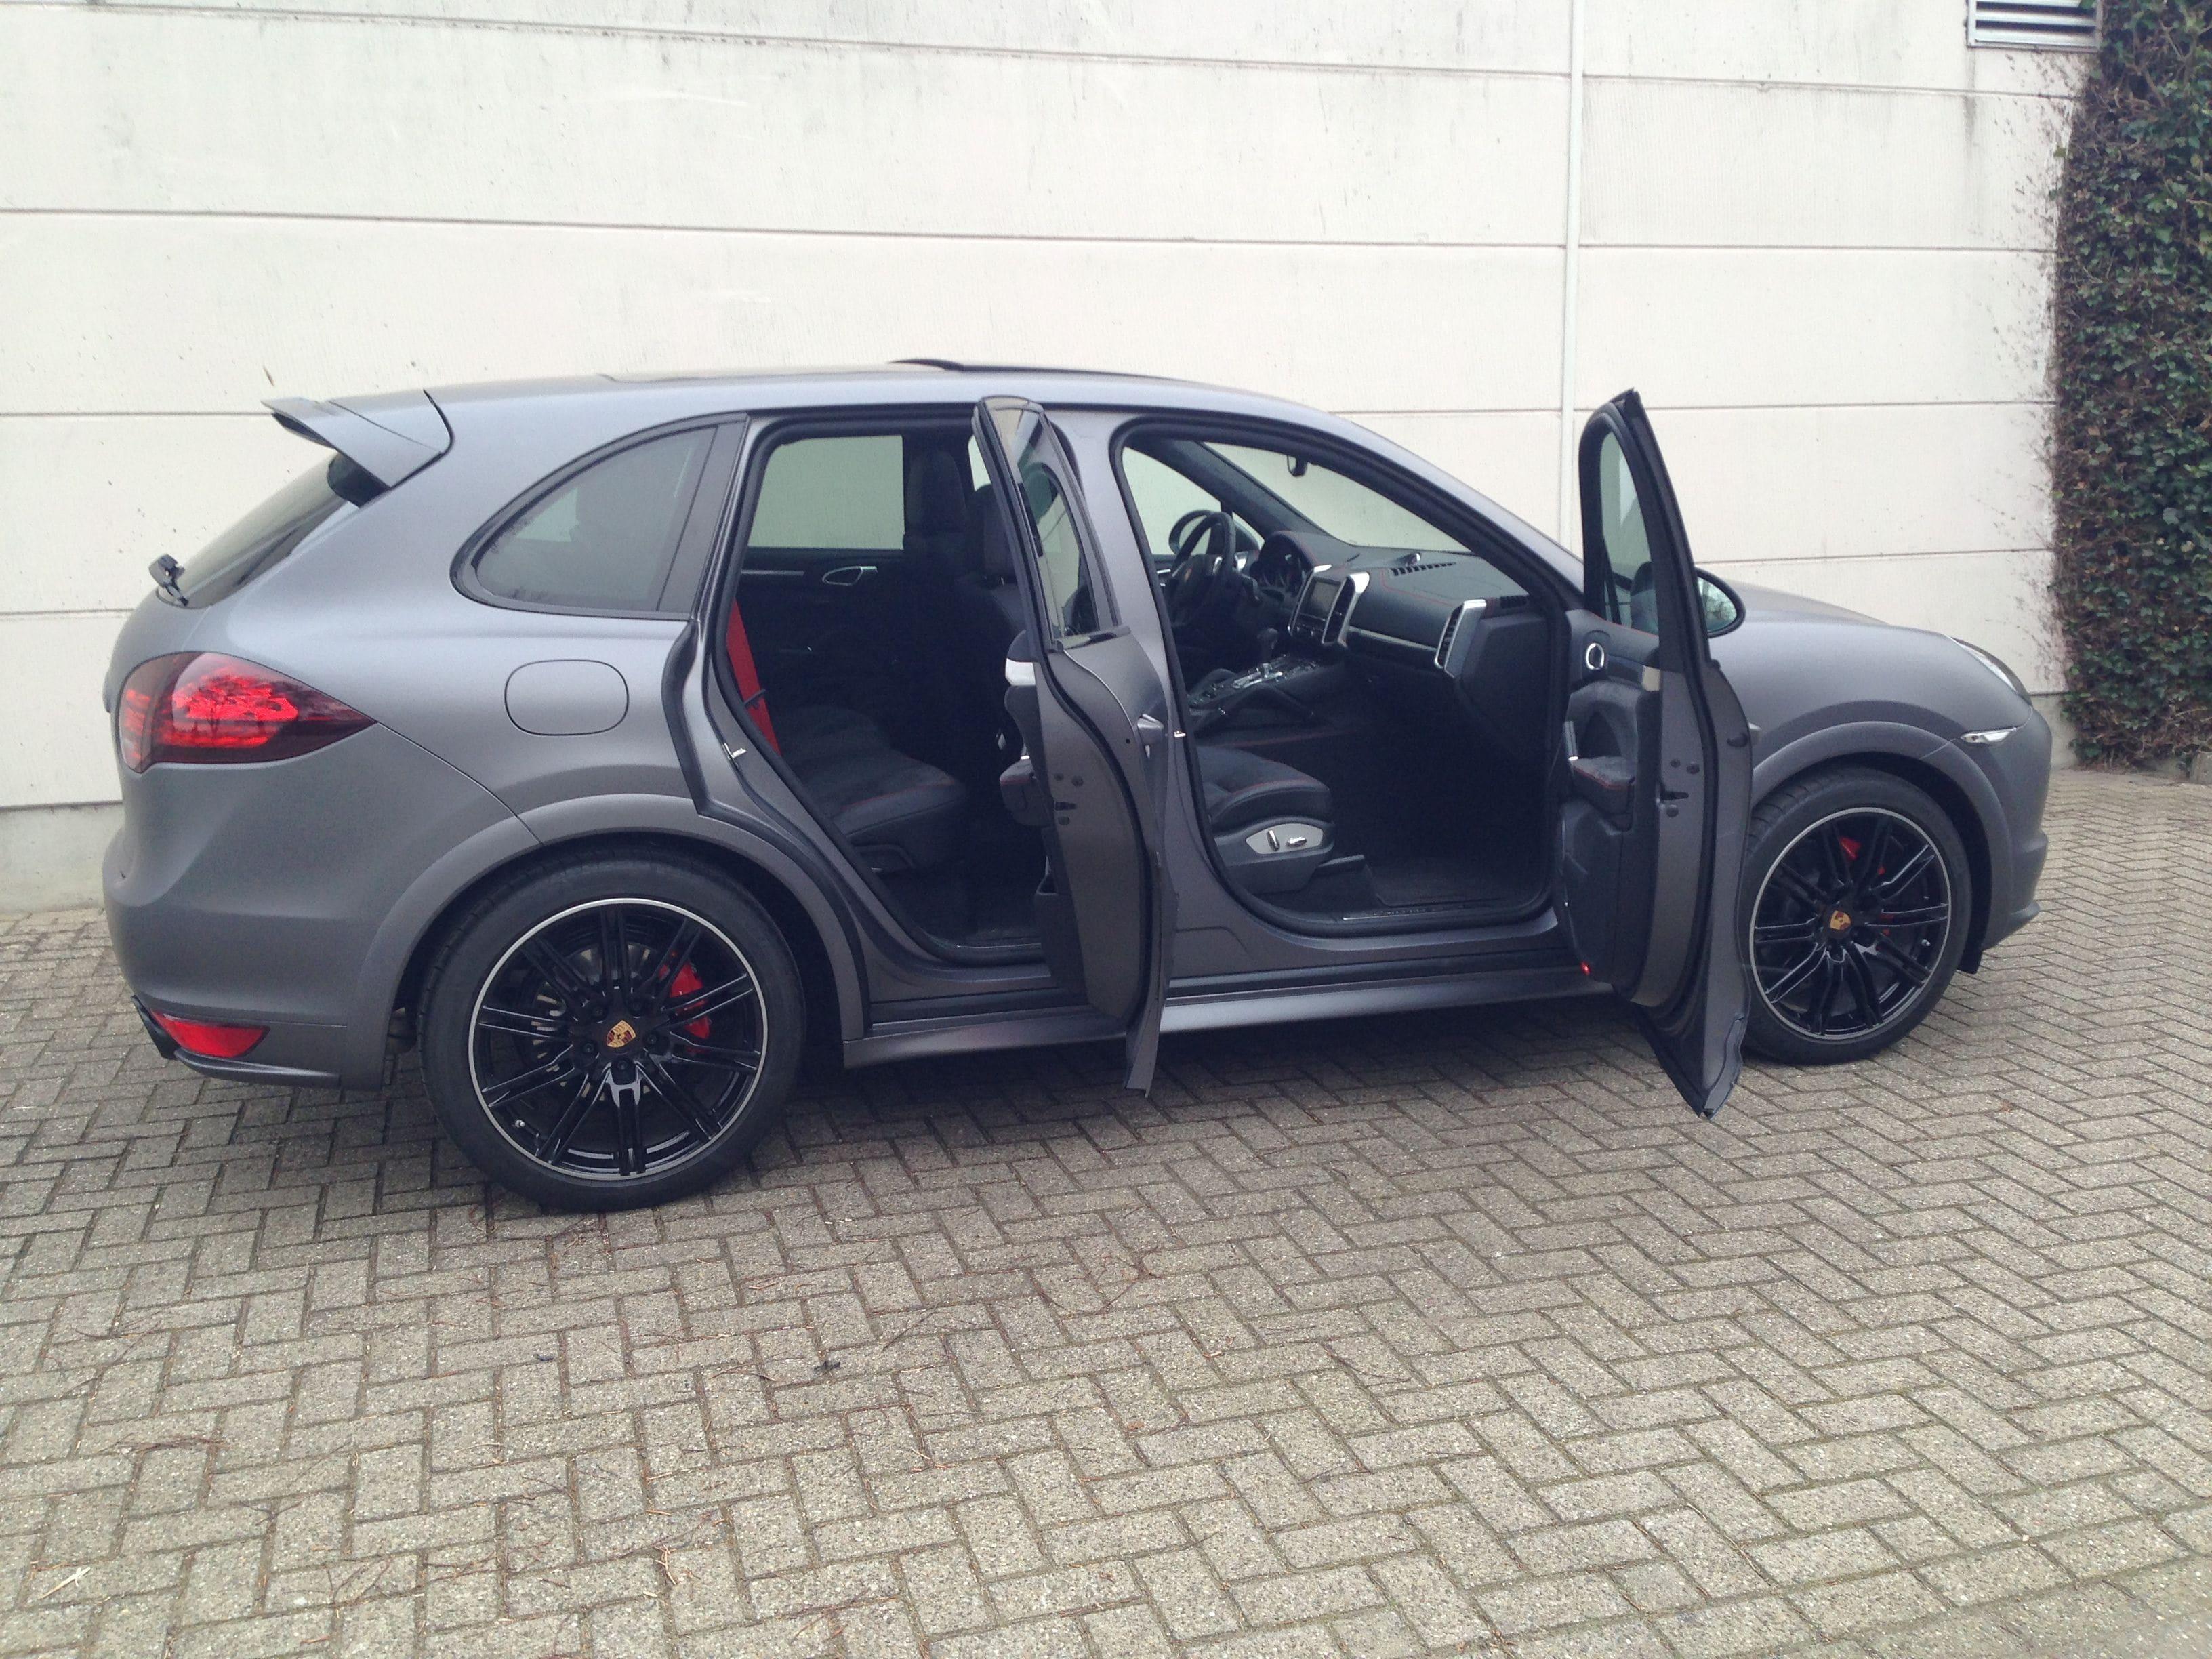 Porsche Cayenne GTS met Gunpowder Wrap, Carwrapping door Wrapmyride.nu Foto-nr:6787, ©2021